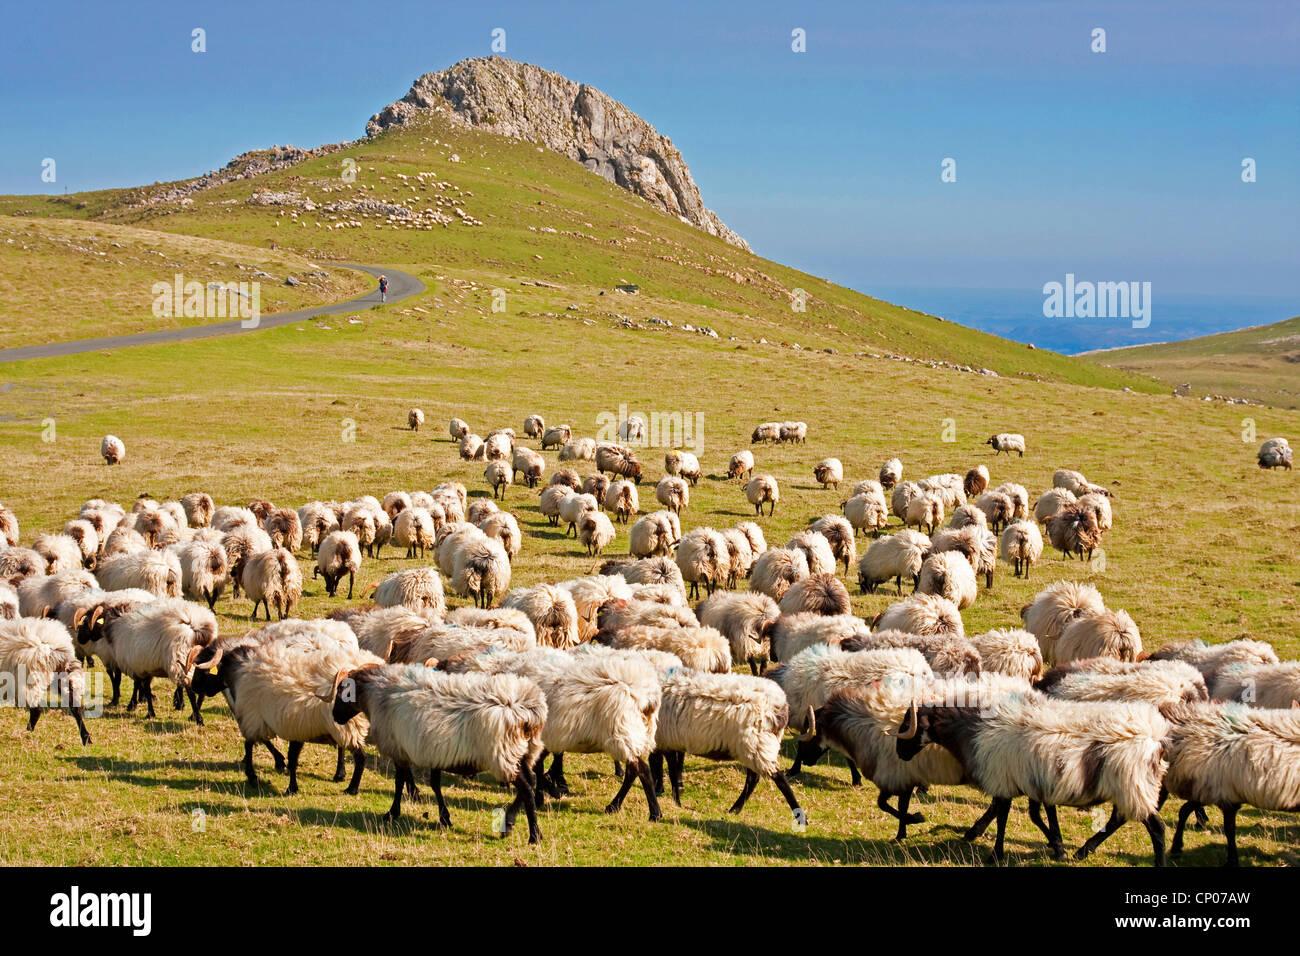 Sheep on camino de santiago am weg weg von st jean pied de port nach stock photo royalty free - St jean pied de port to santiago ...